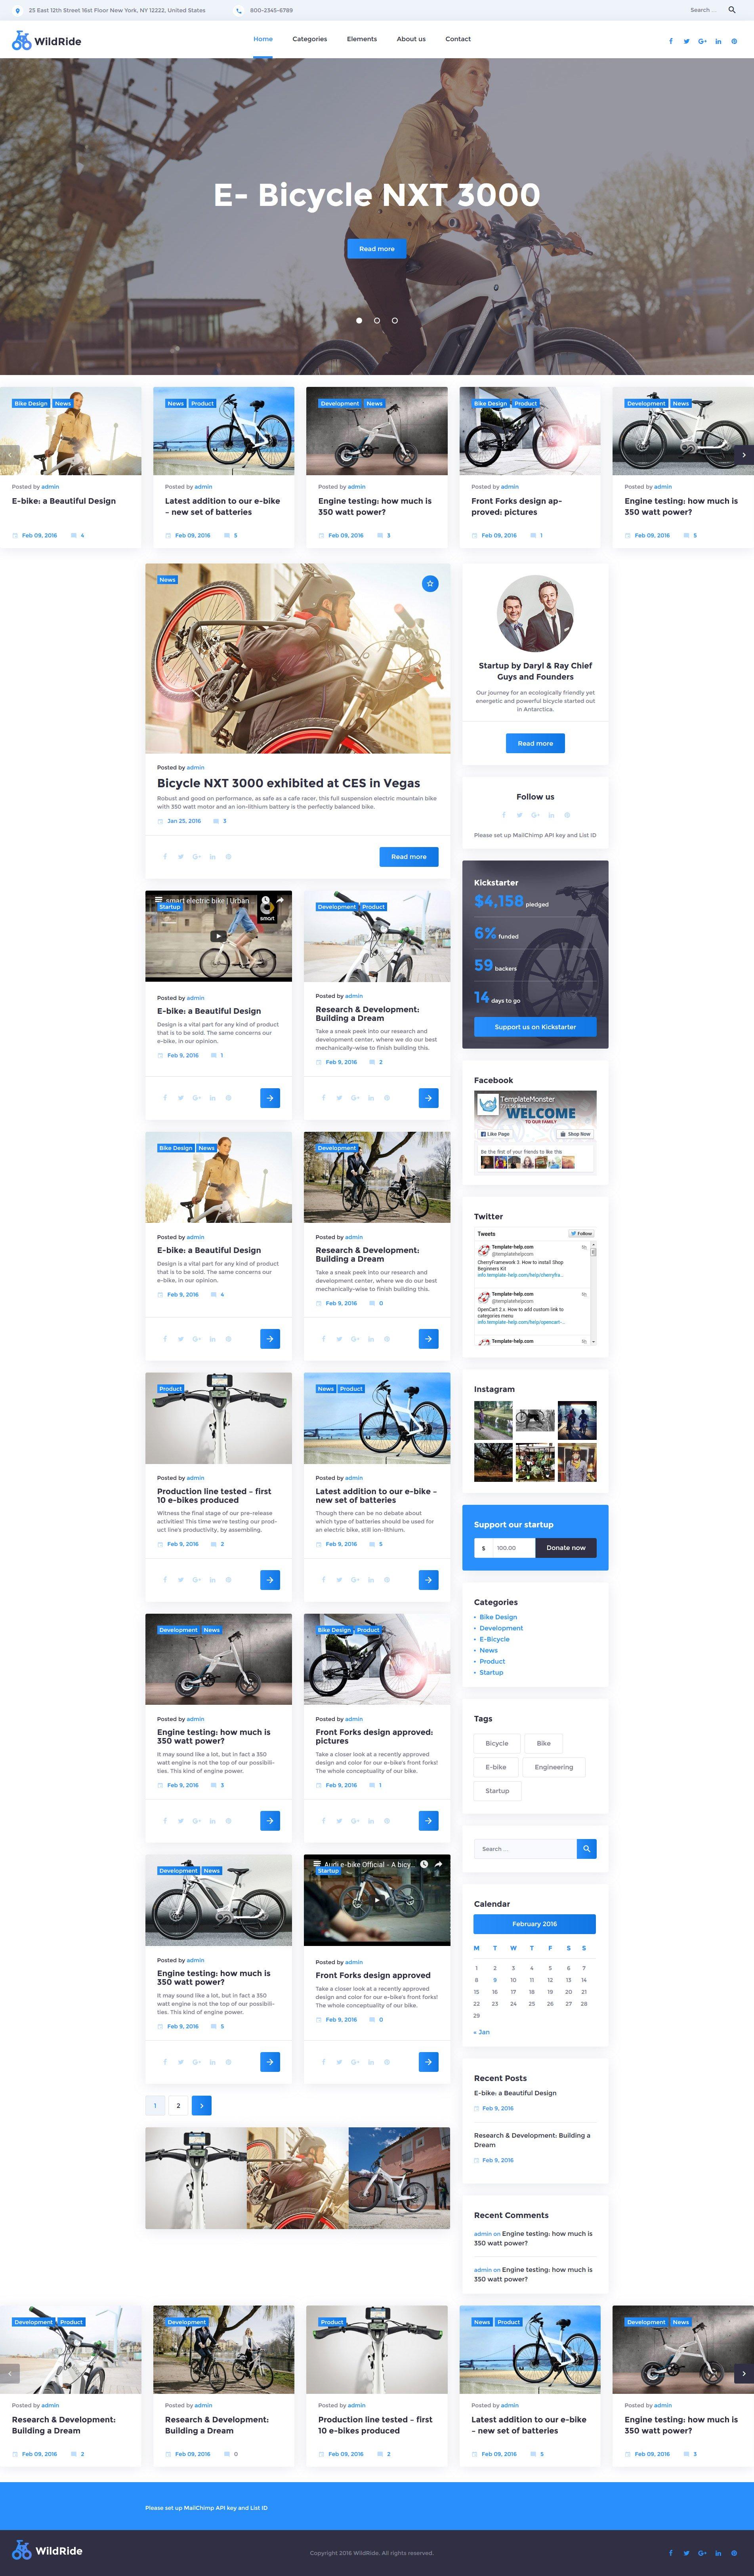 """WildRide - Sports Bicycle"" - адаптивний WordPress шаблон №58378"